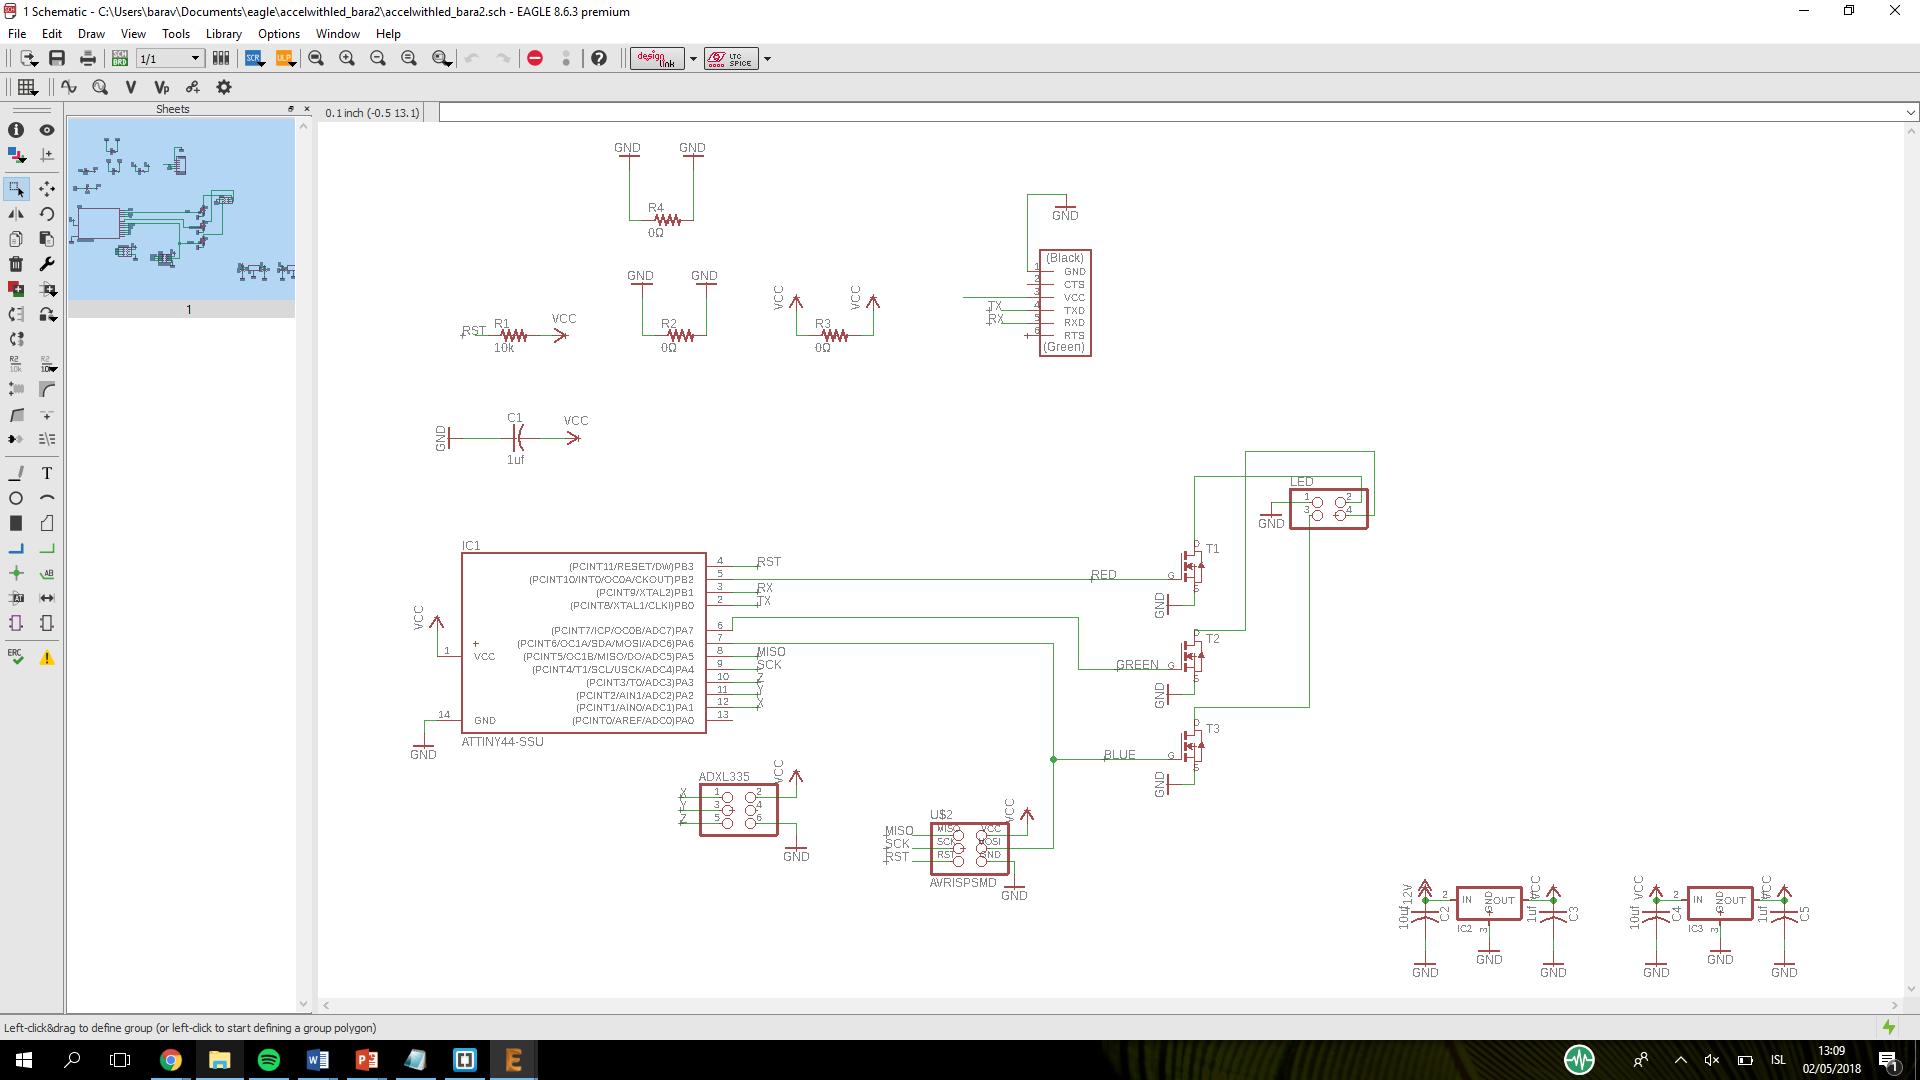 Week 12 Accelerometer Schematic Then Soldering Is Just Too Easy Now After Having Soldered The